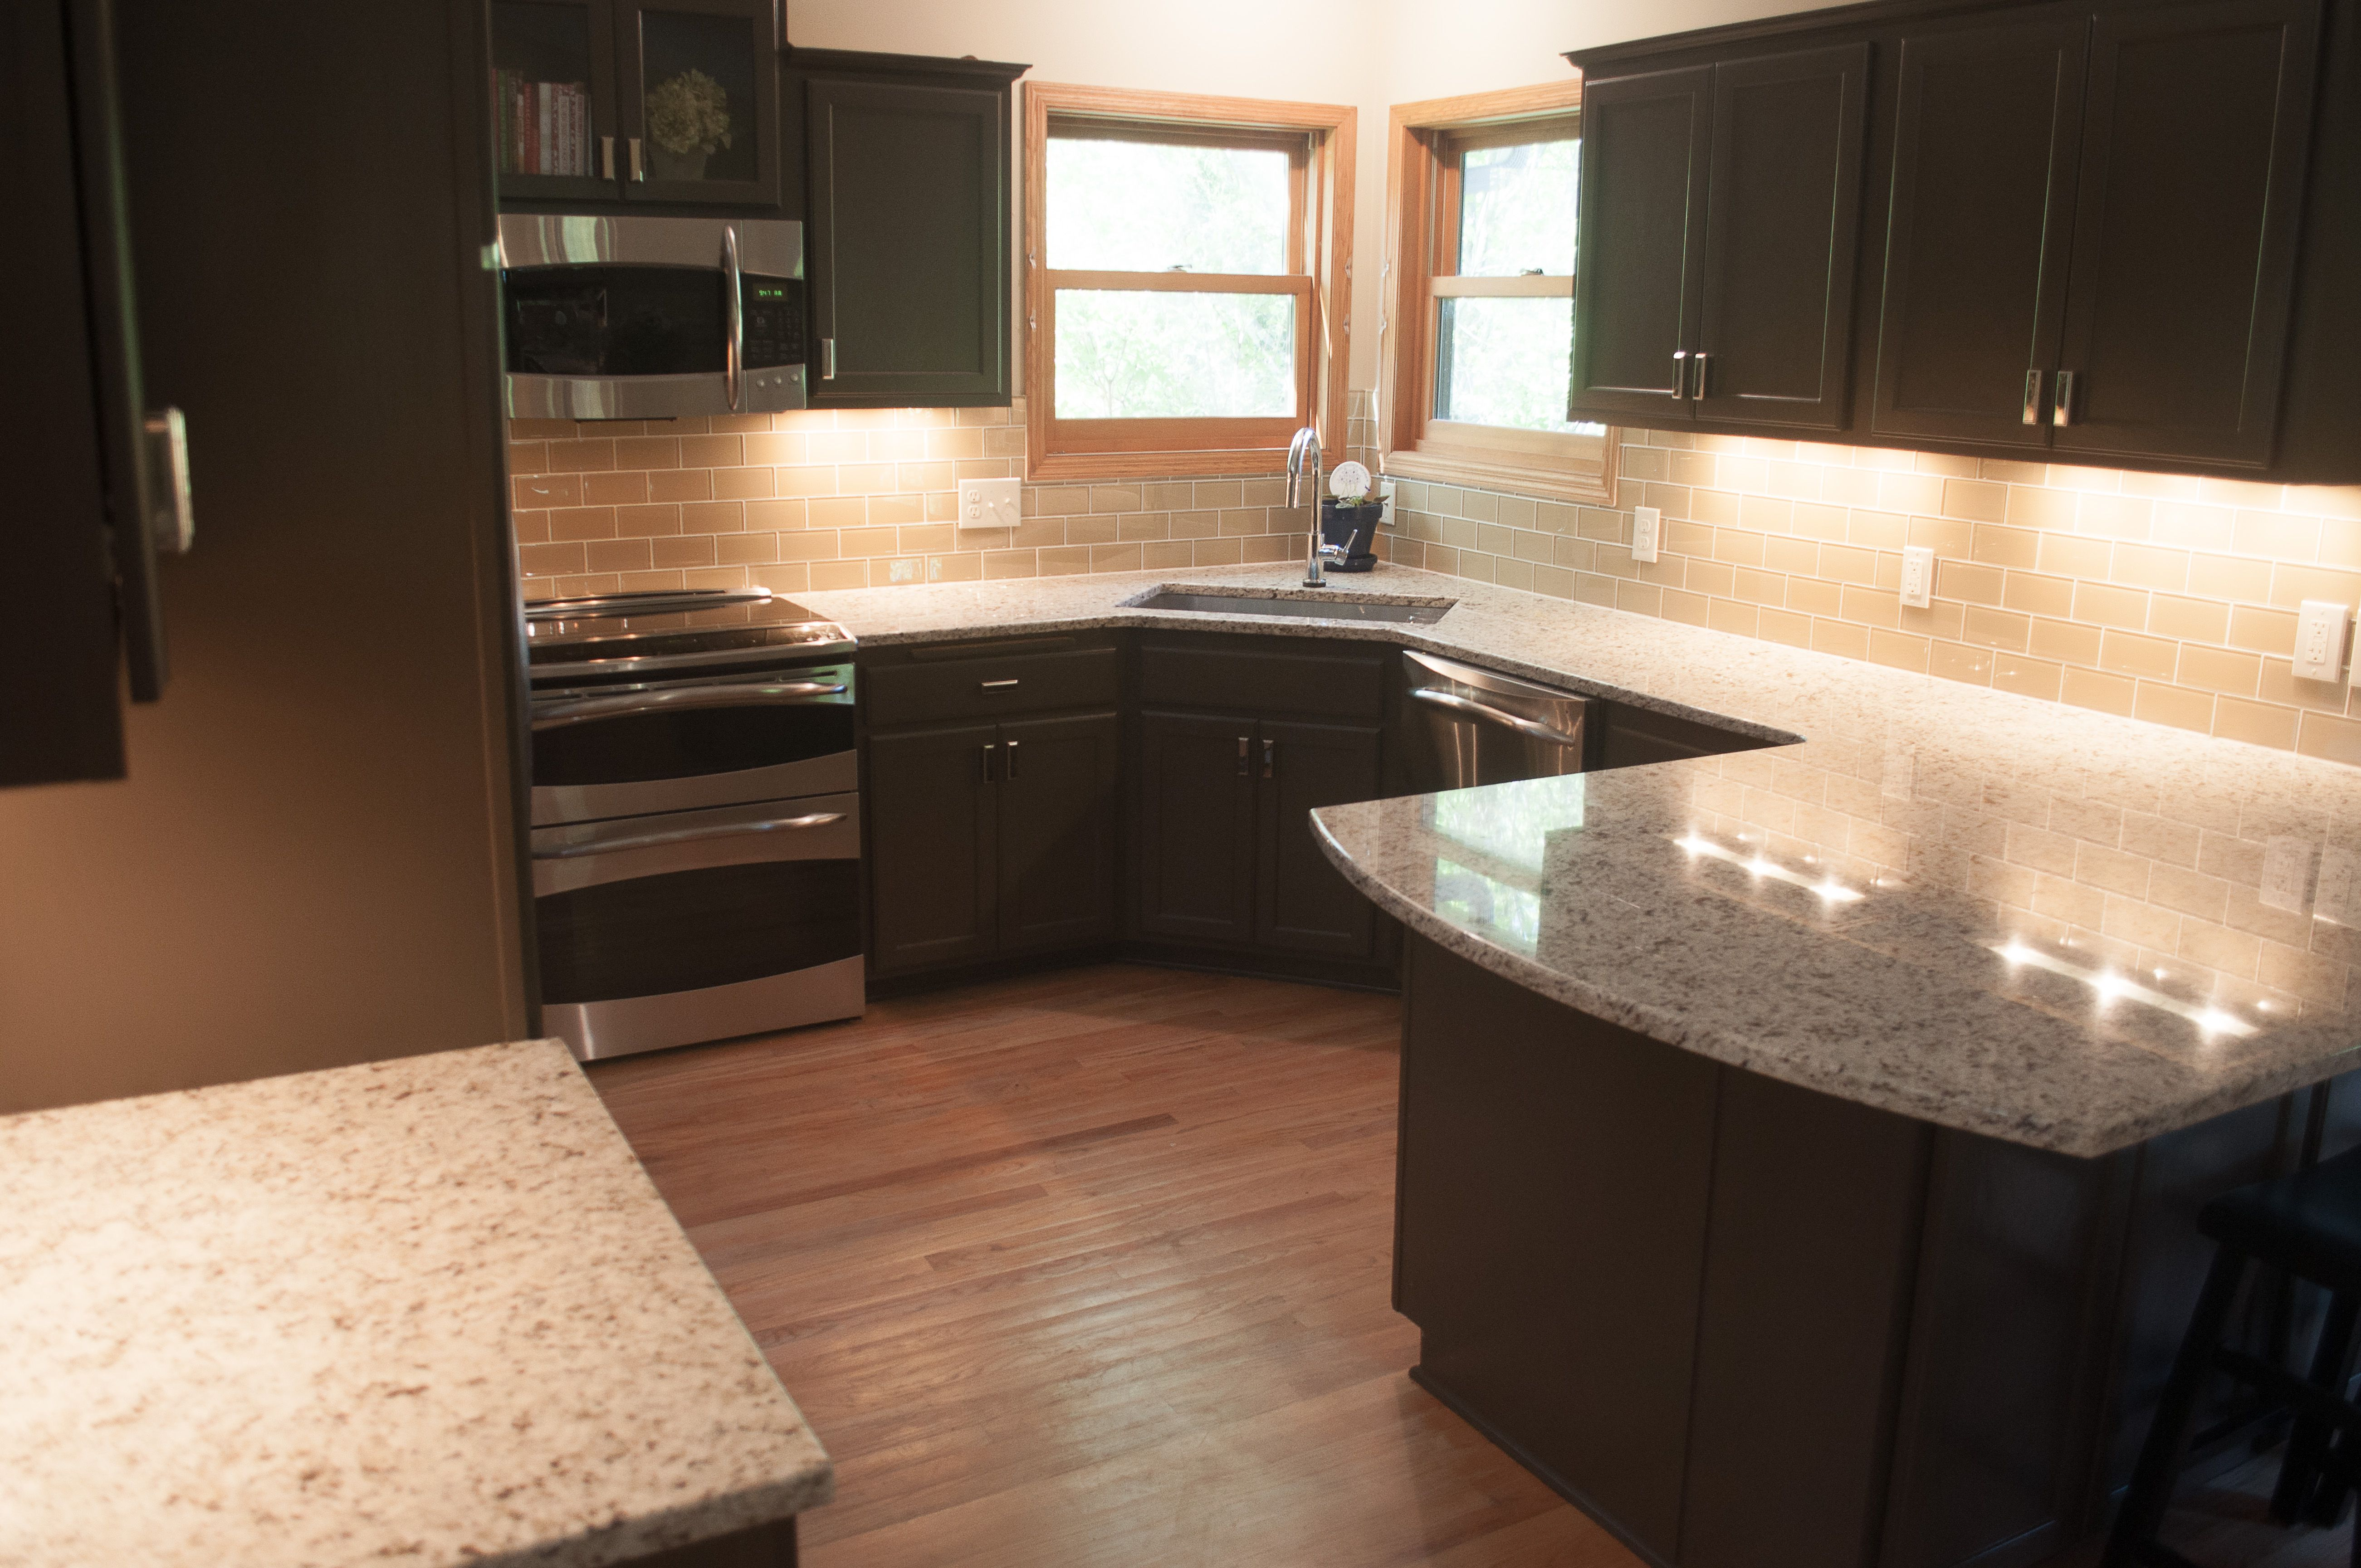 after from golden oak cabinets | Black kitchen decor ...